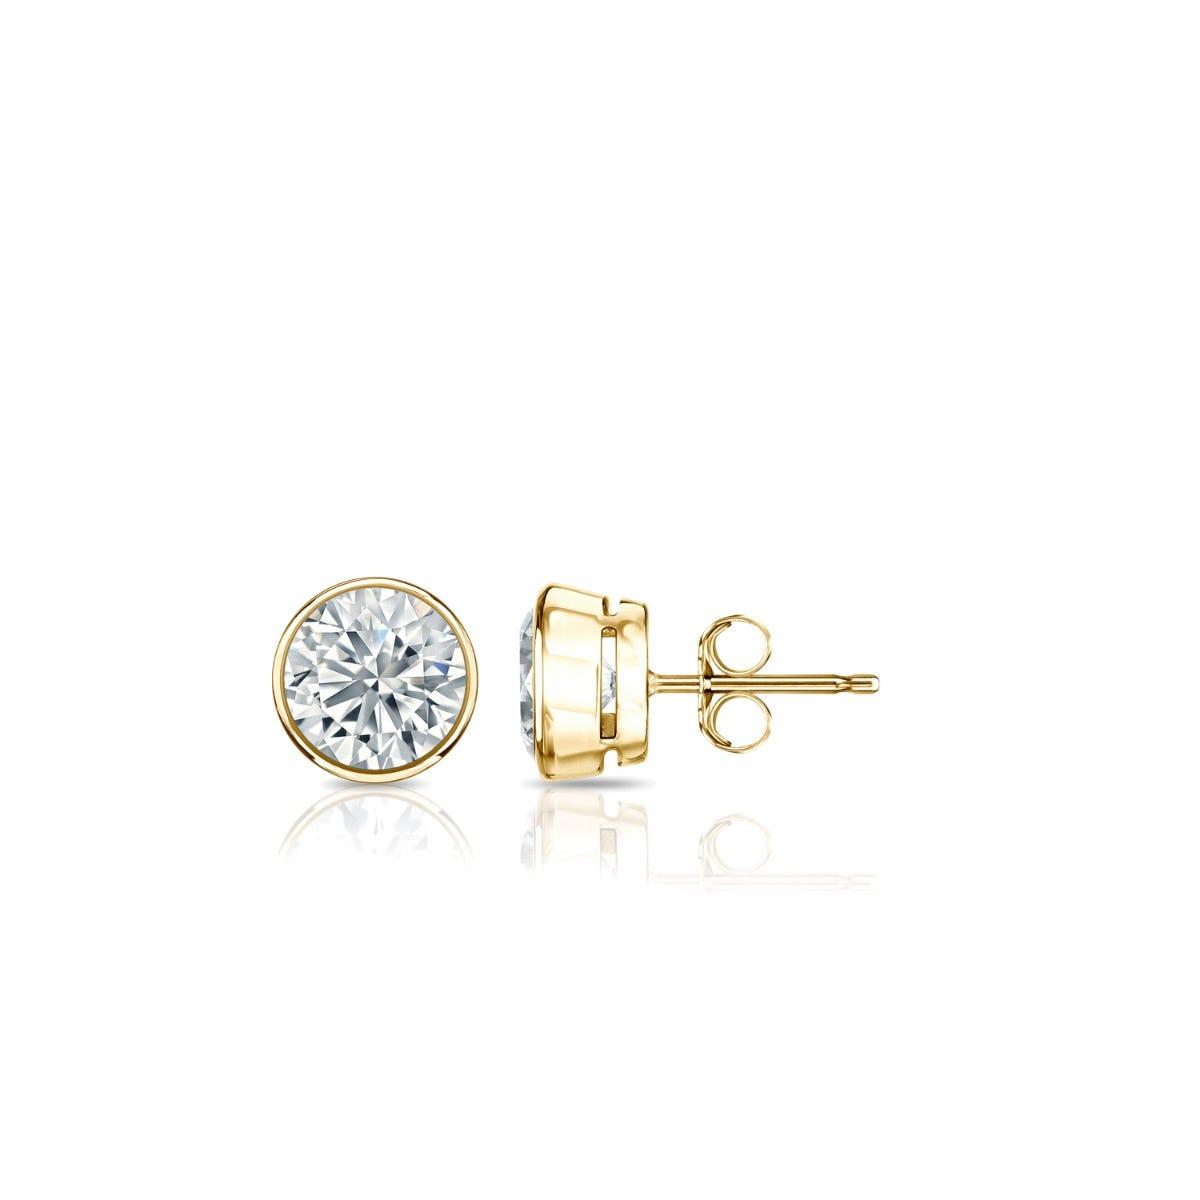 Diamond Round Bezel-Set 1/3ctw. Solitaire Stud (IJ-I2) Earrings in 18K Yellow Gold